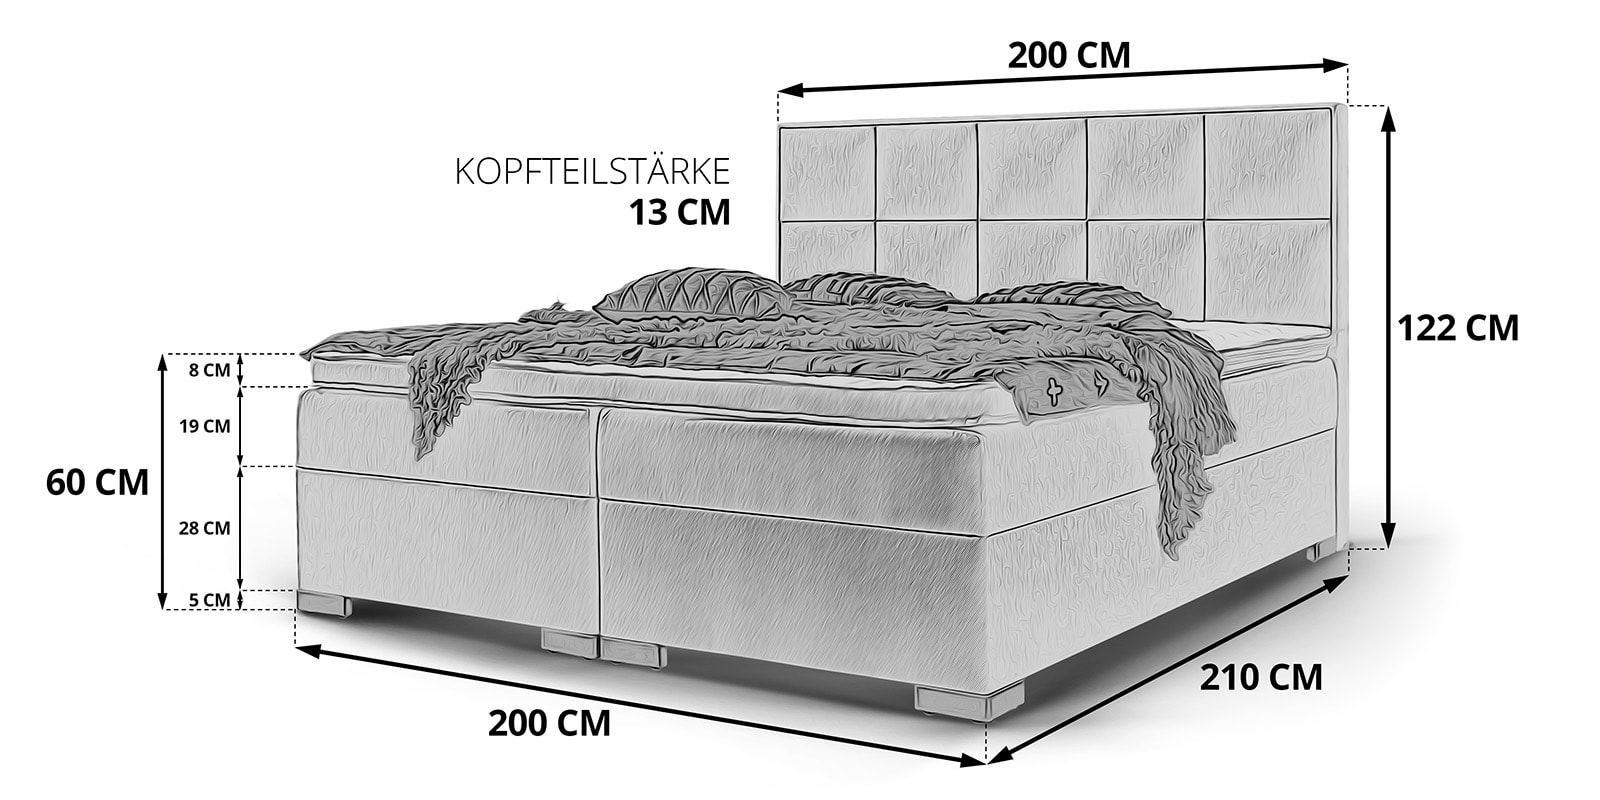 Full Size of Bett 200x200 Stauraum Boxspringbett Mit Bettkasten Arizona Skizze Coole Betten Kinder Minion Ausziehbares Massiv Ottoversand Boxspring Jabo Billige 180x200 Wohnzimmer Bett 200x200 Stauraum